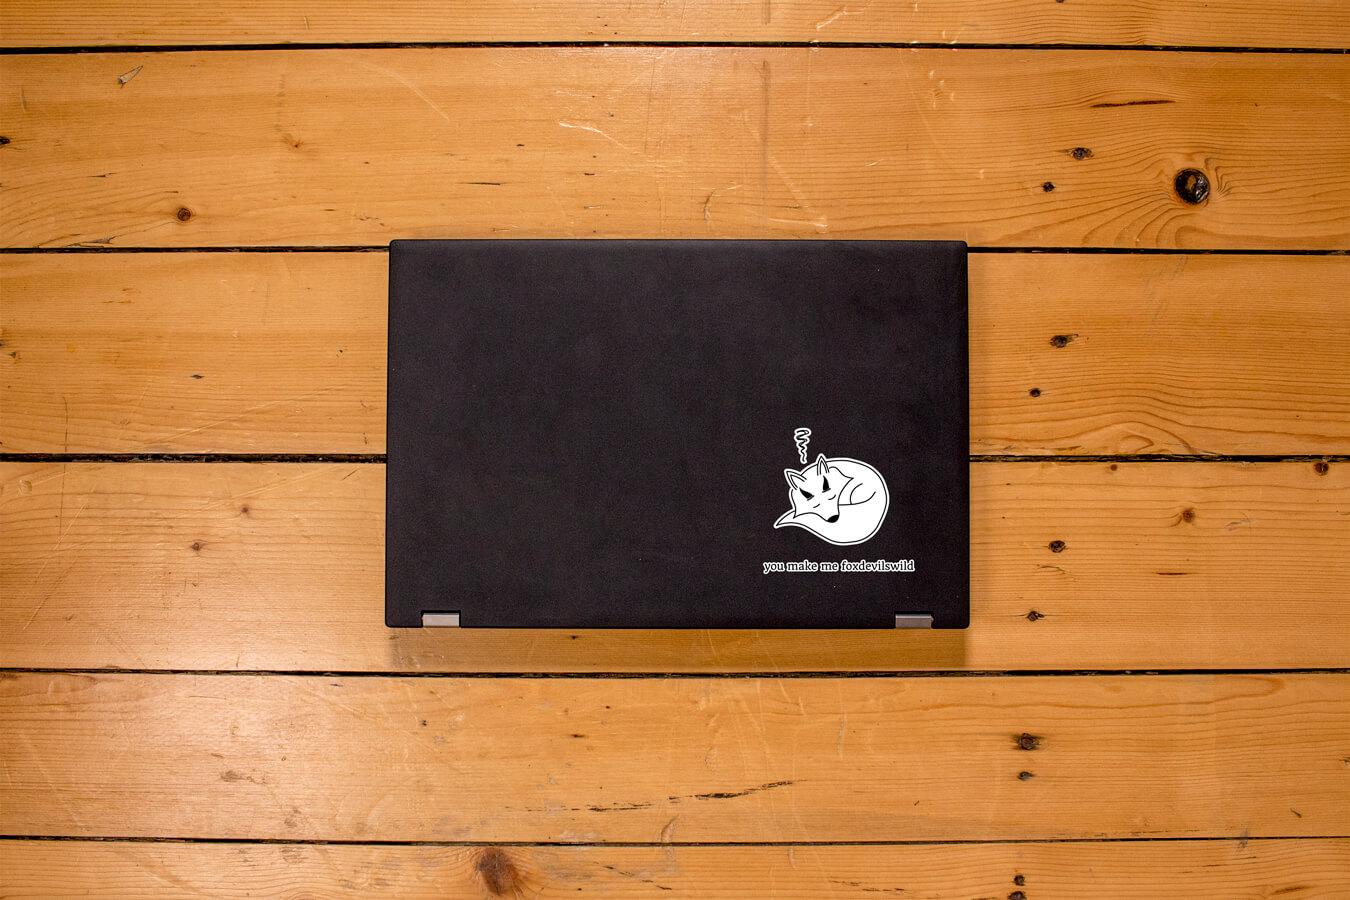 Produktbild Sticker you make me foxdevilswild auf Laptop